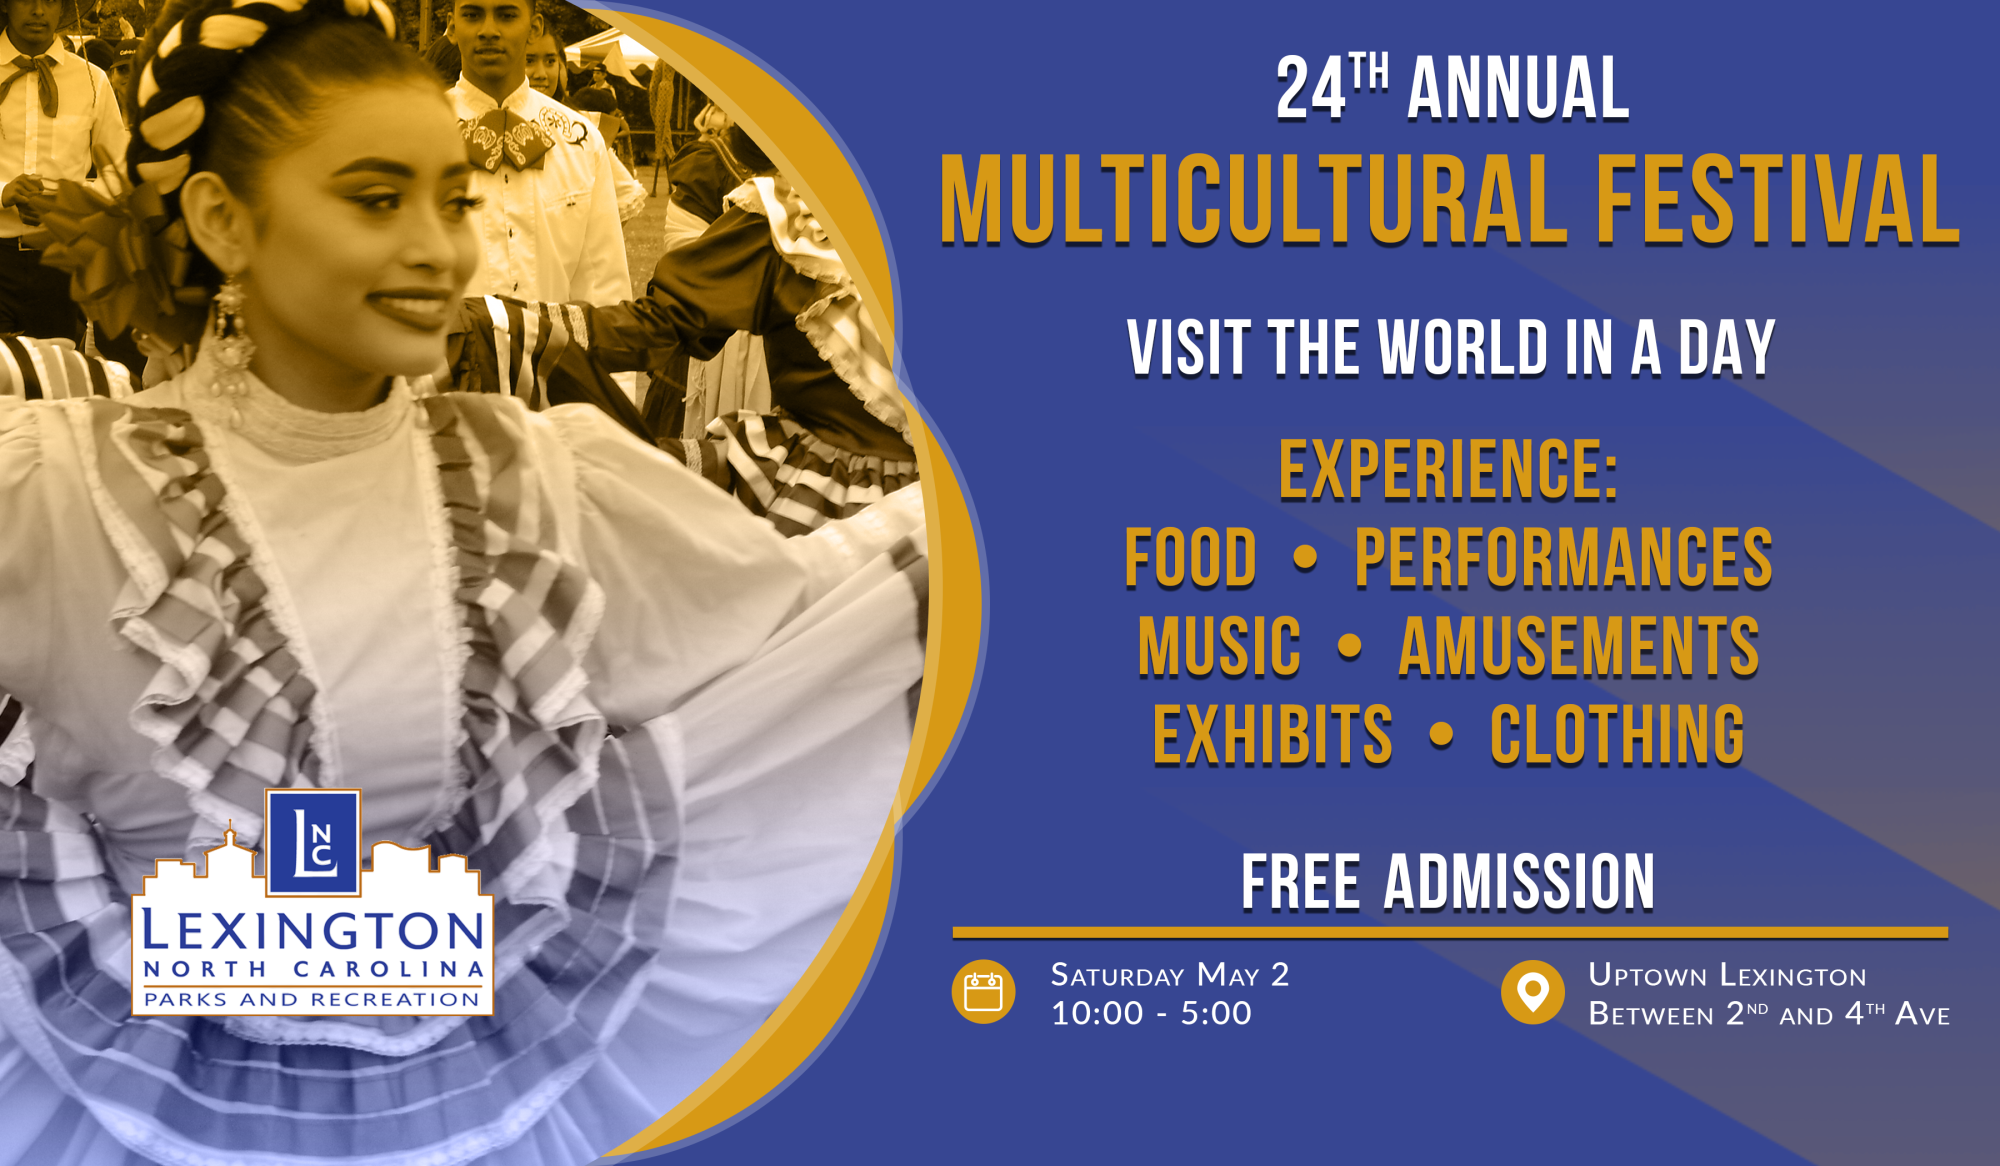 2020 Multicultural Festival